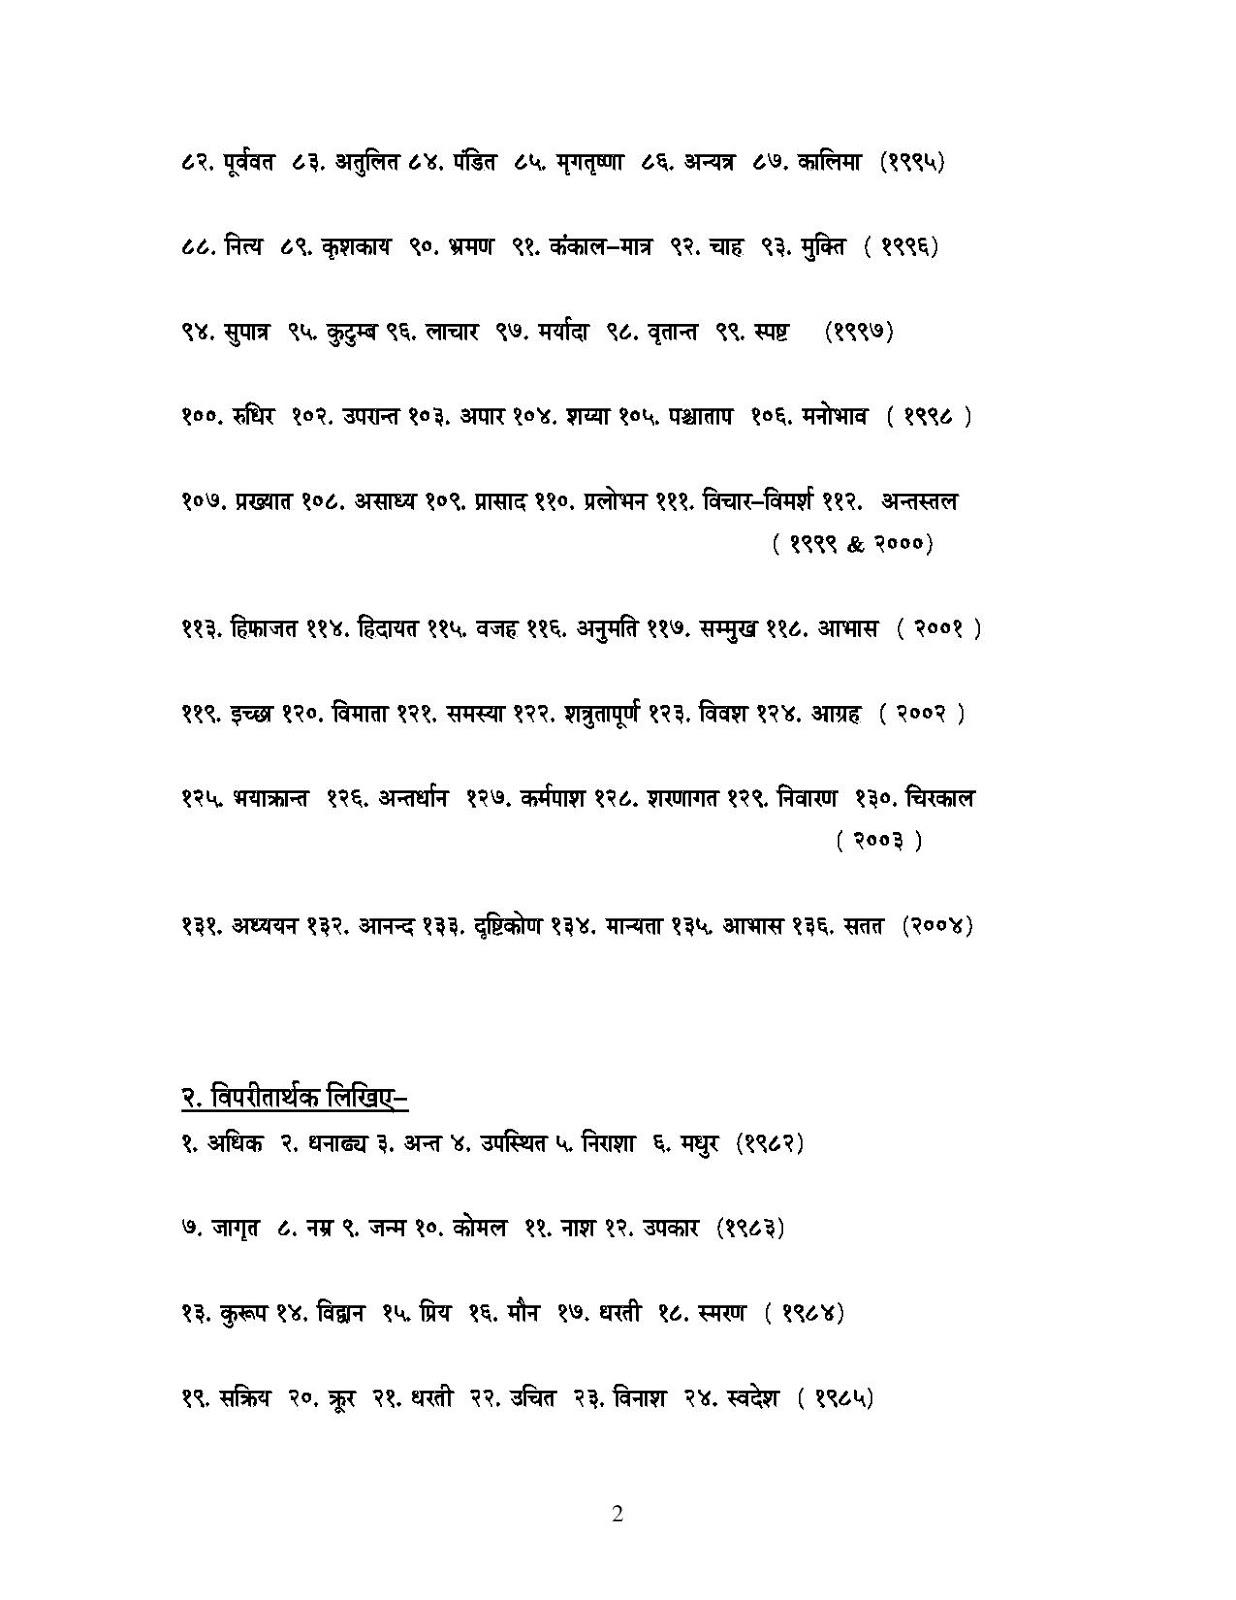 Hindi Grammar Work Sheet Collection For Classes 5 6 7 Amp 8 Grammar Work Sheet For Icse Board